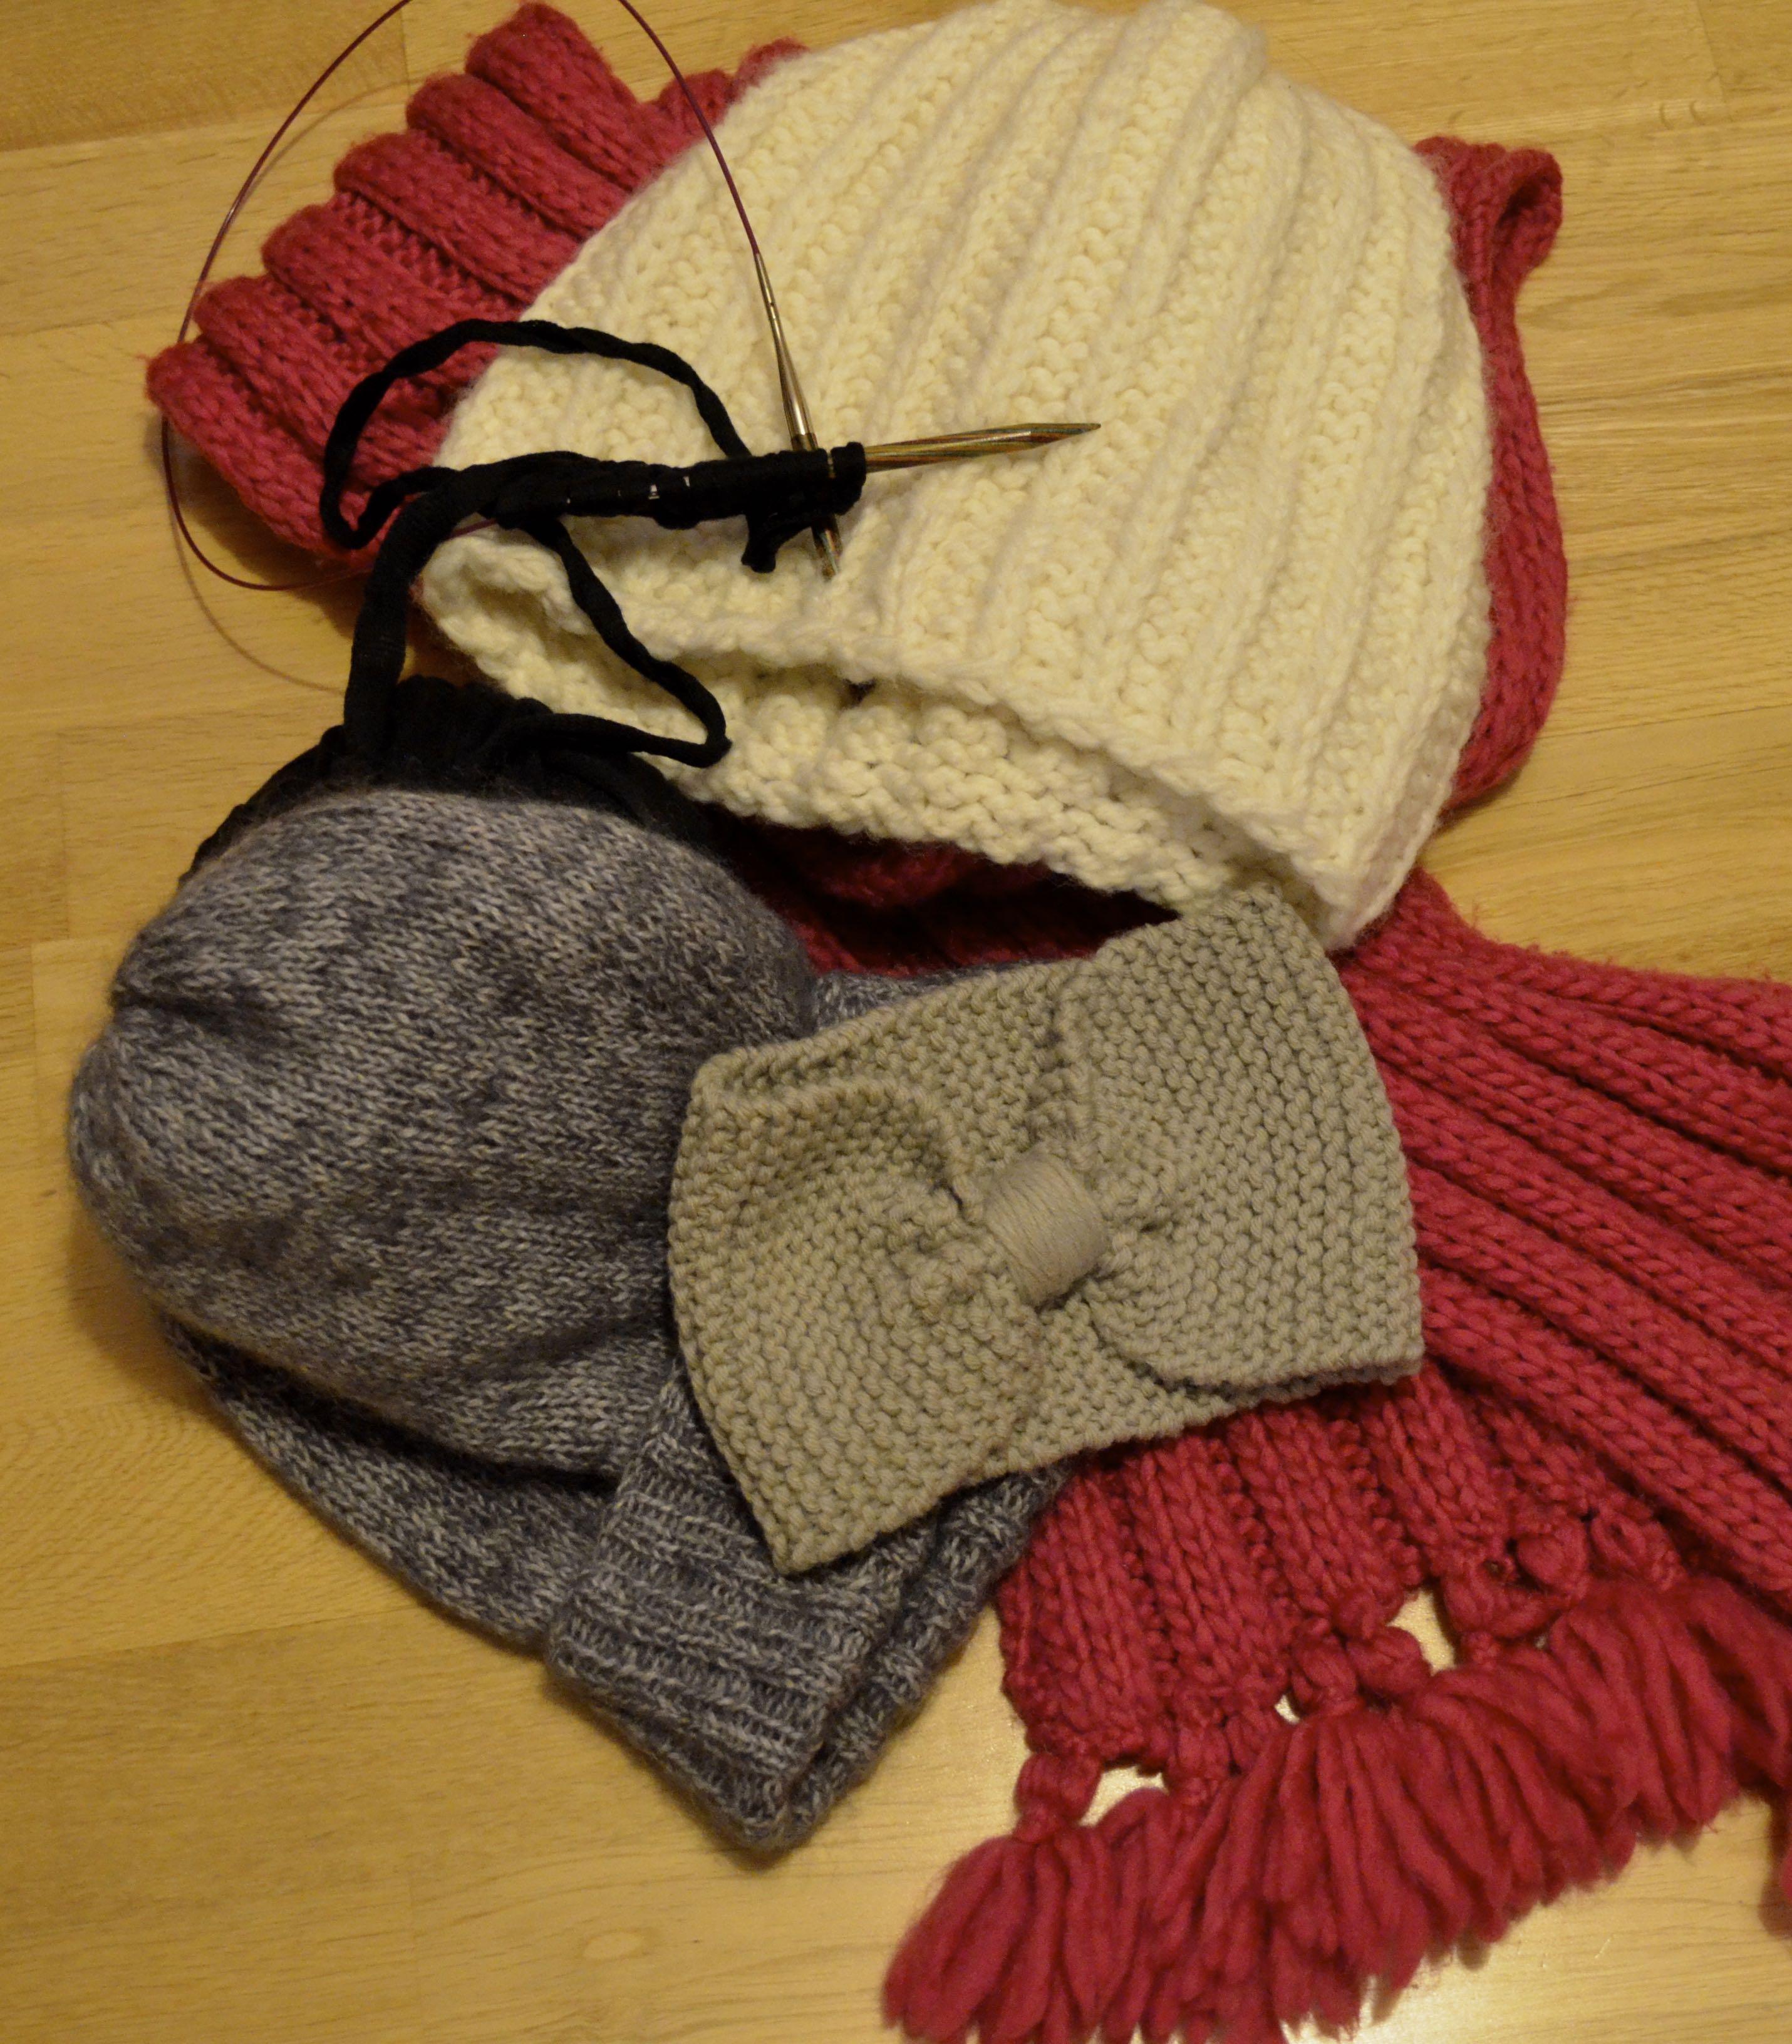 Handmade Christmas Gift Guide 2